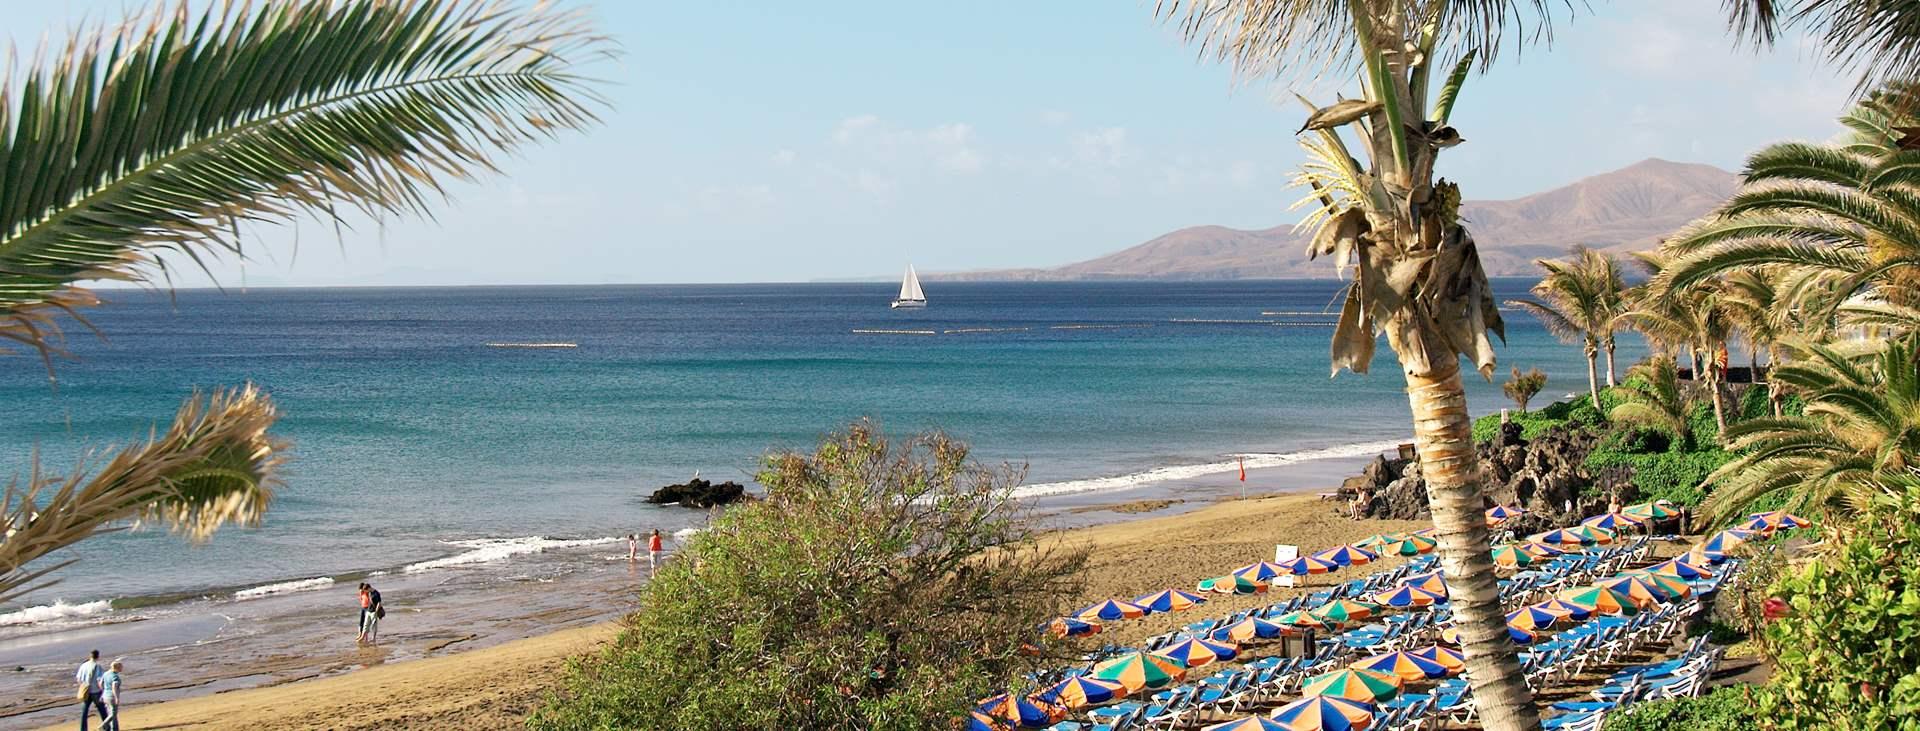 Bestill en reise med Ving til Lanzarote